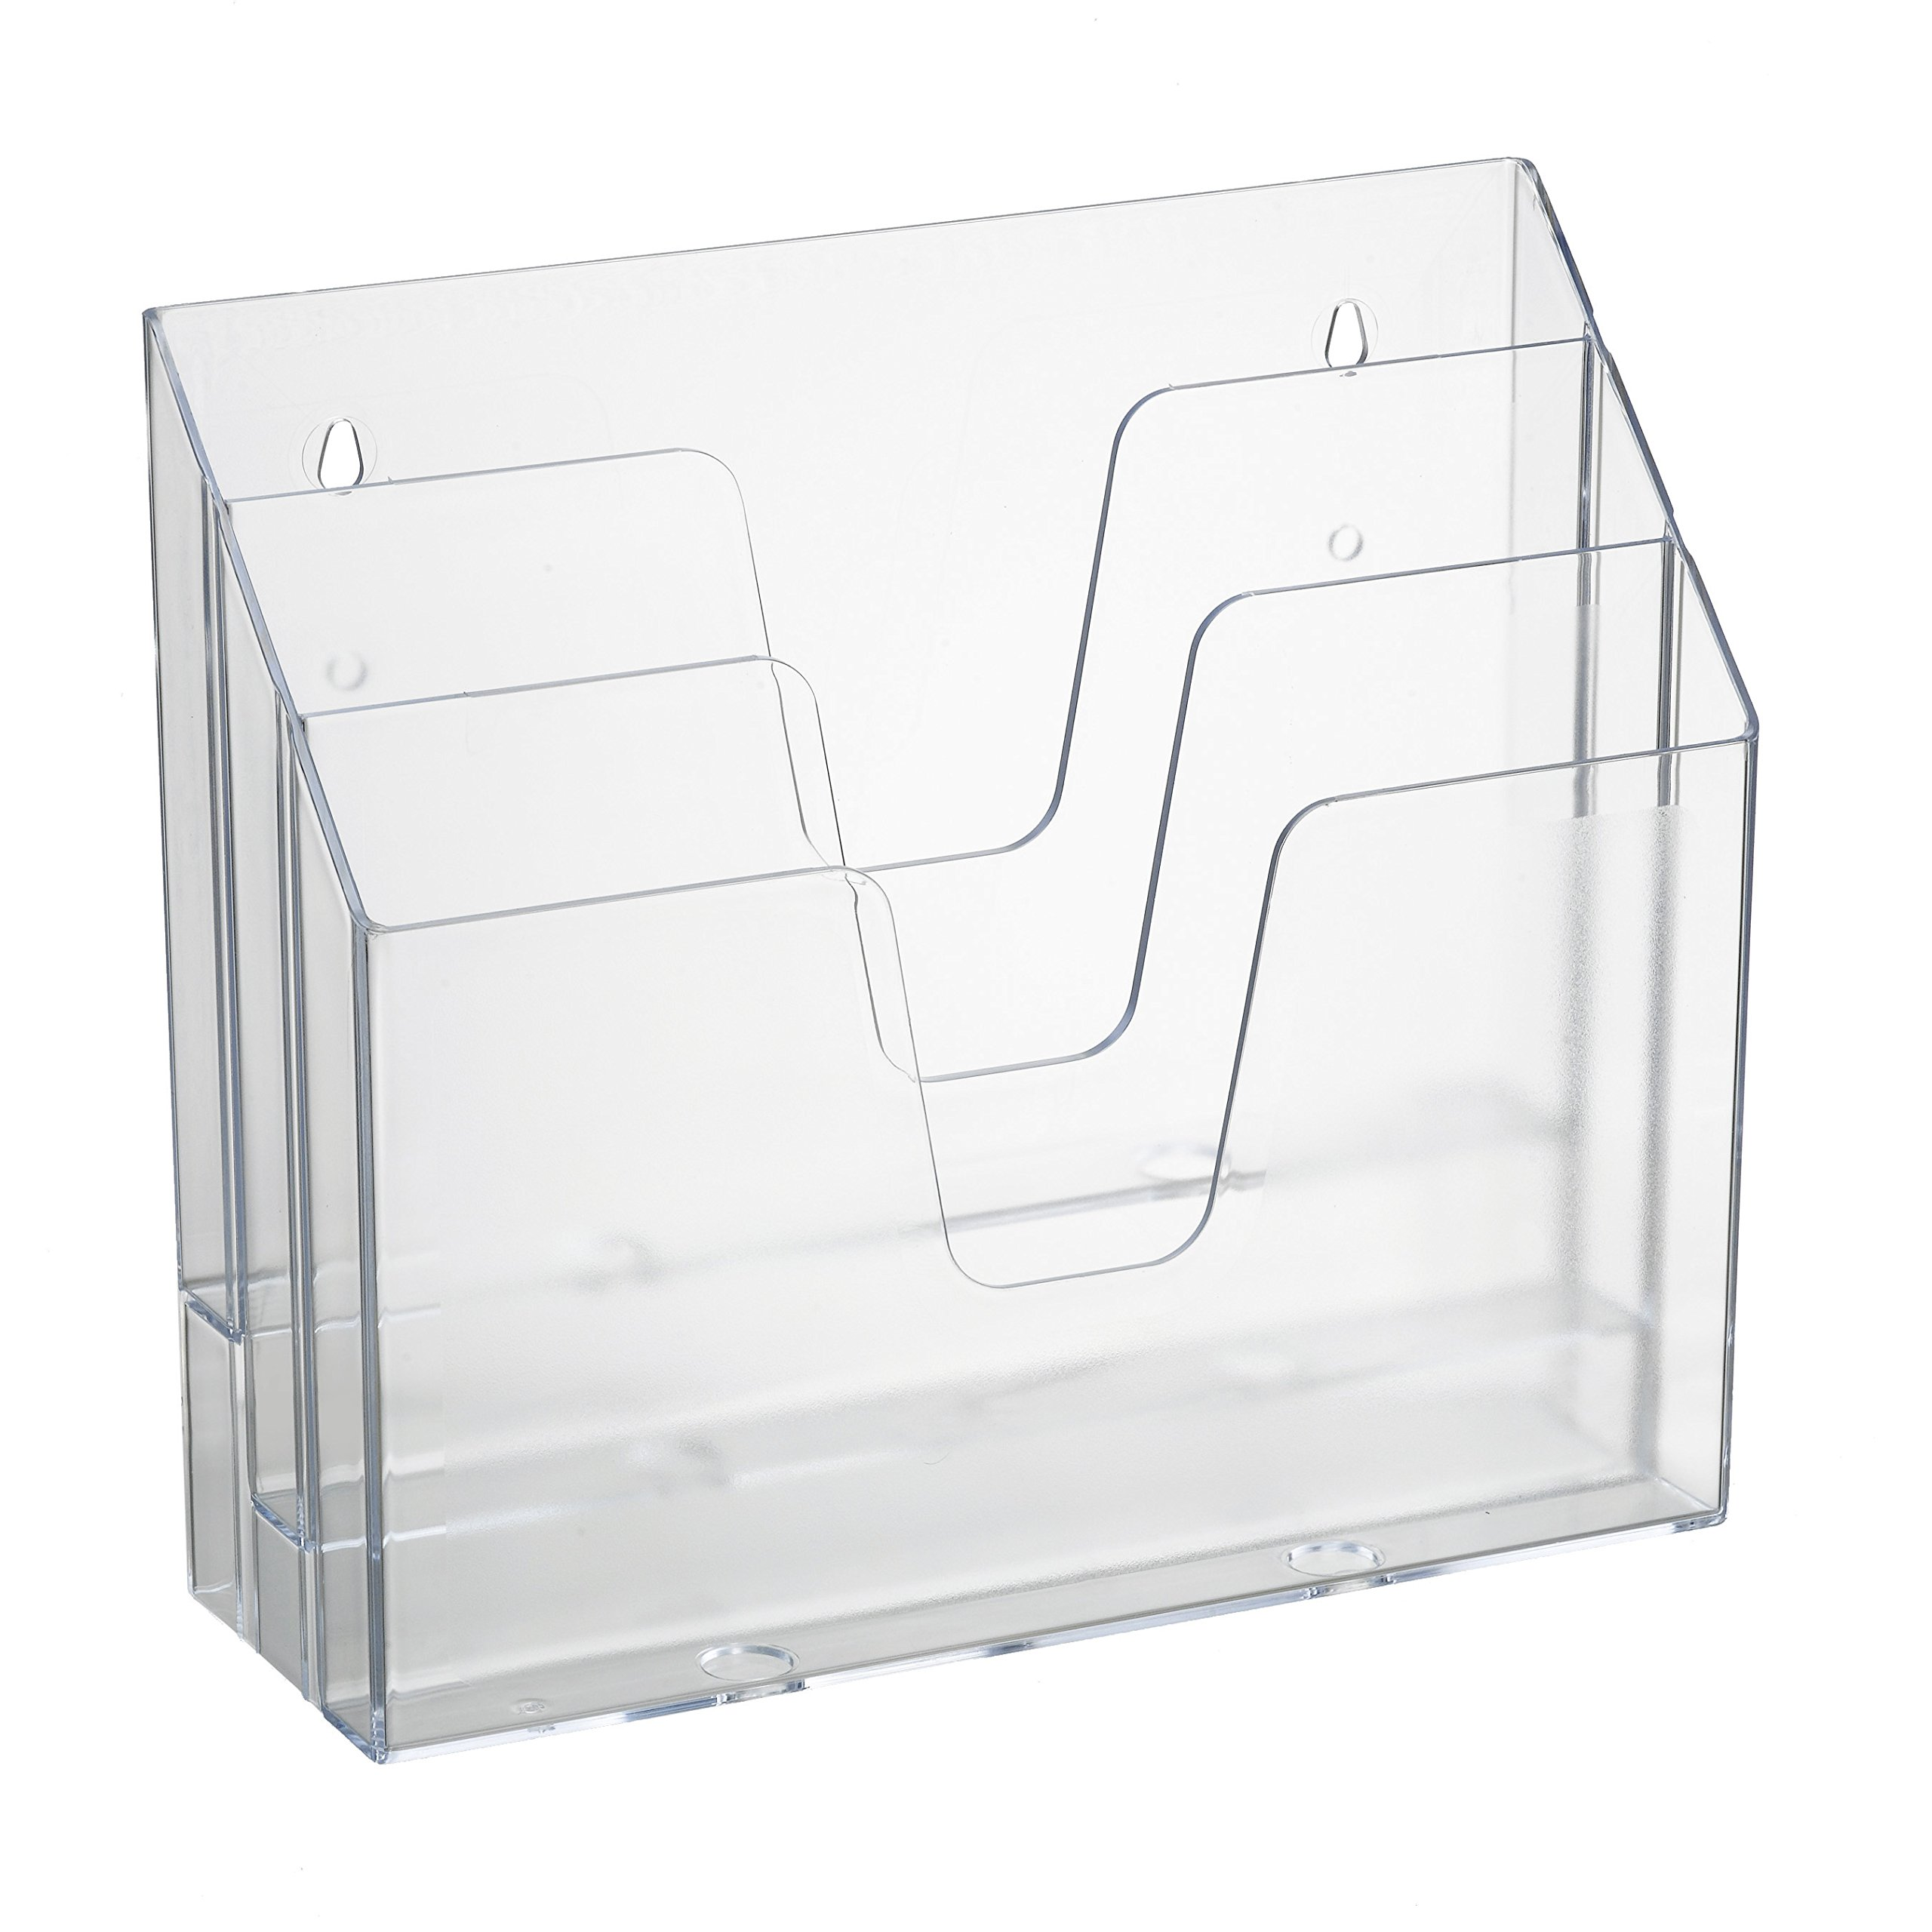 Acrimet Horizontal Triple File Folder Organizer (Clear Crystal Color) by Acrimet